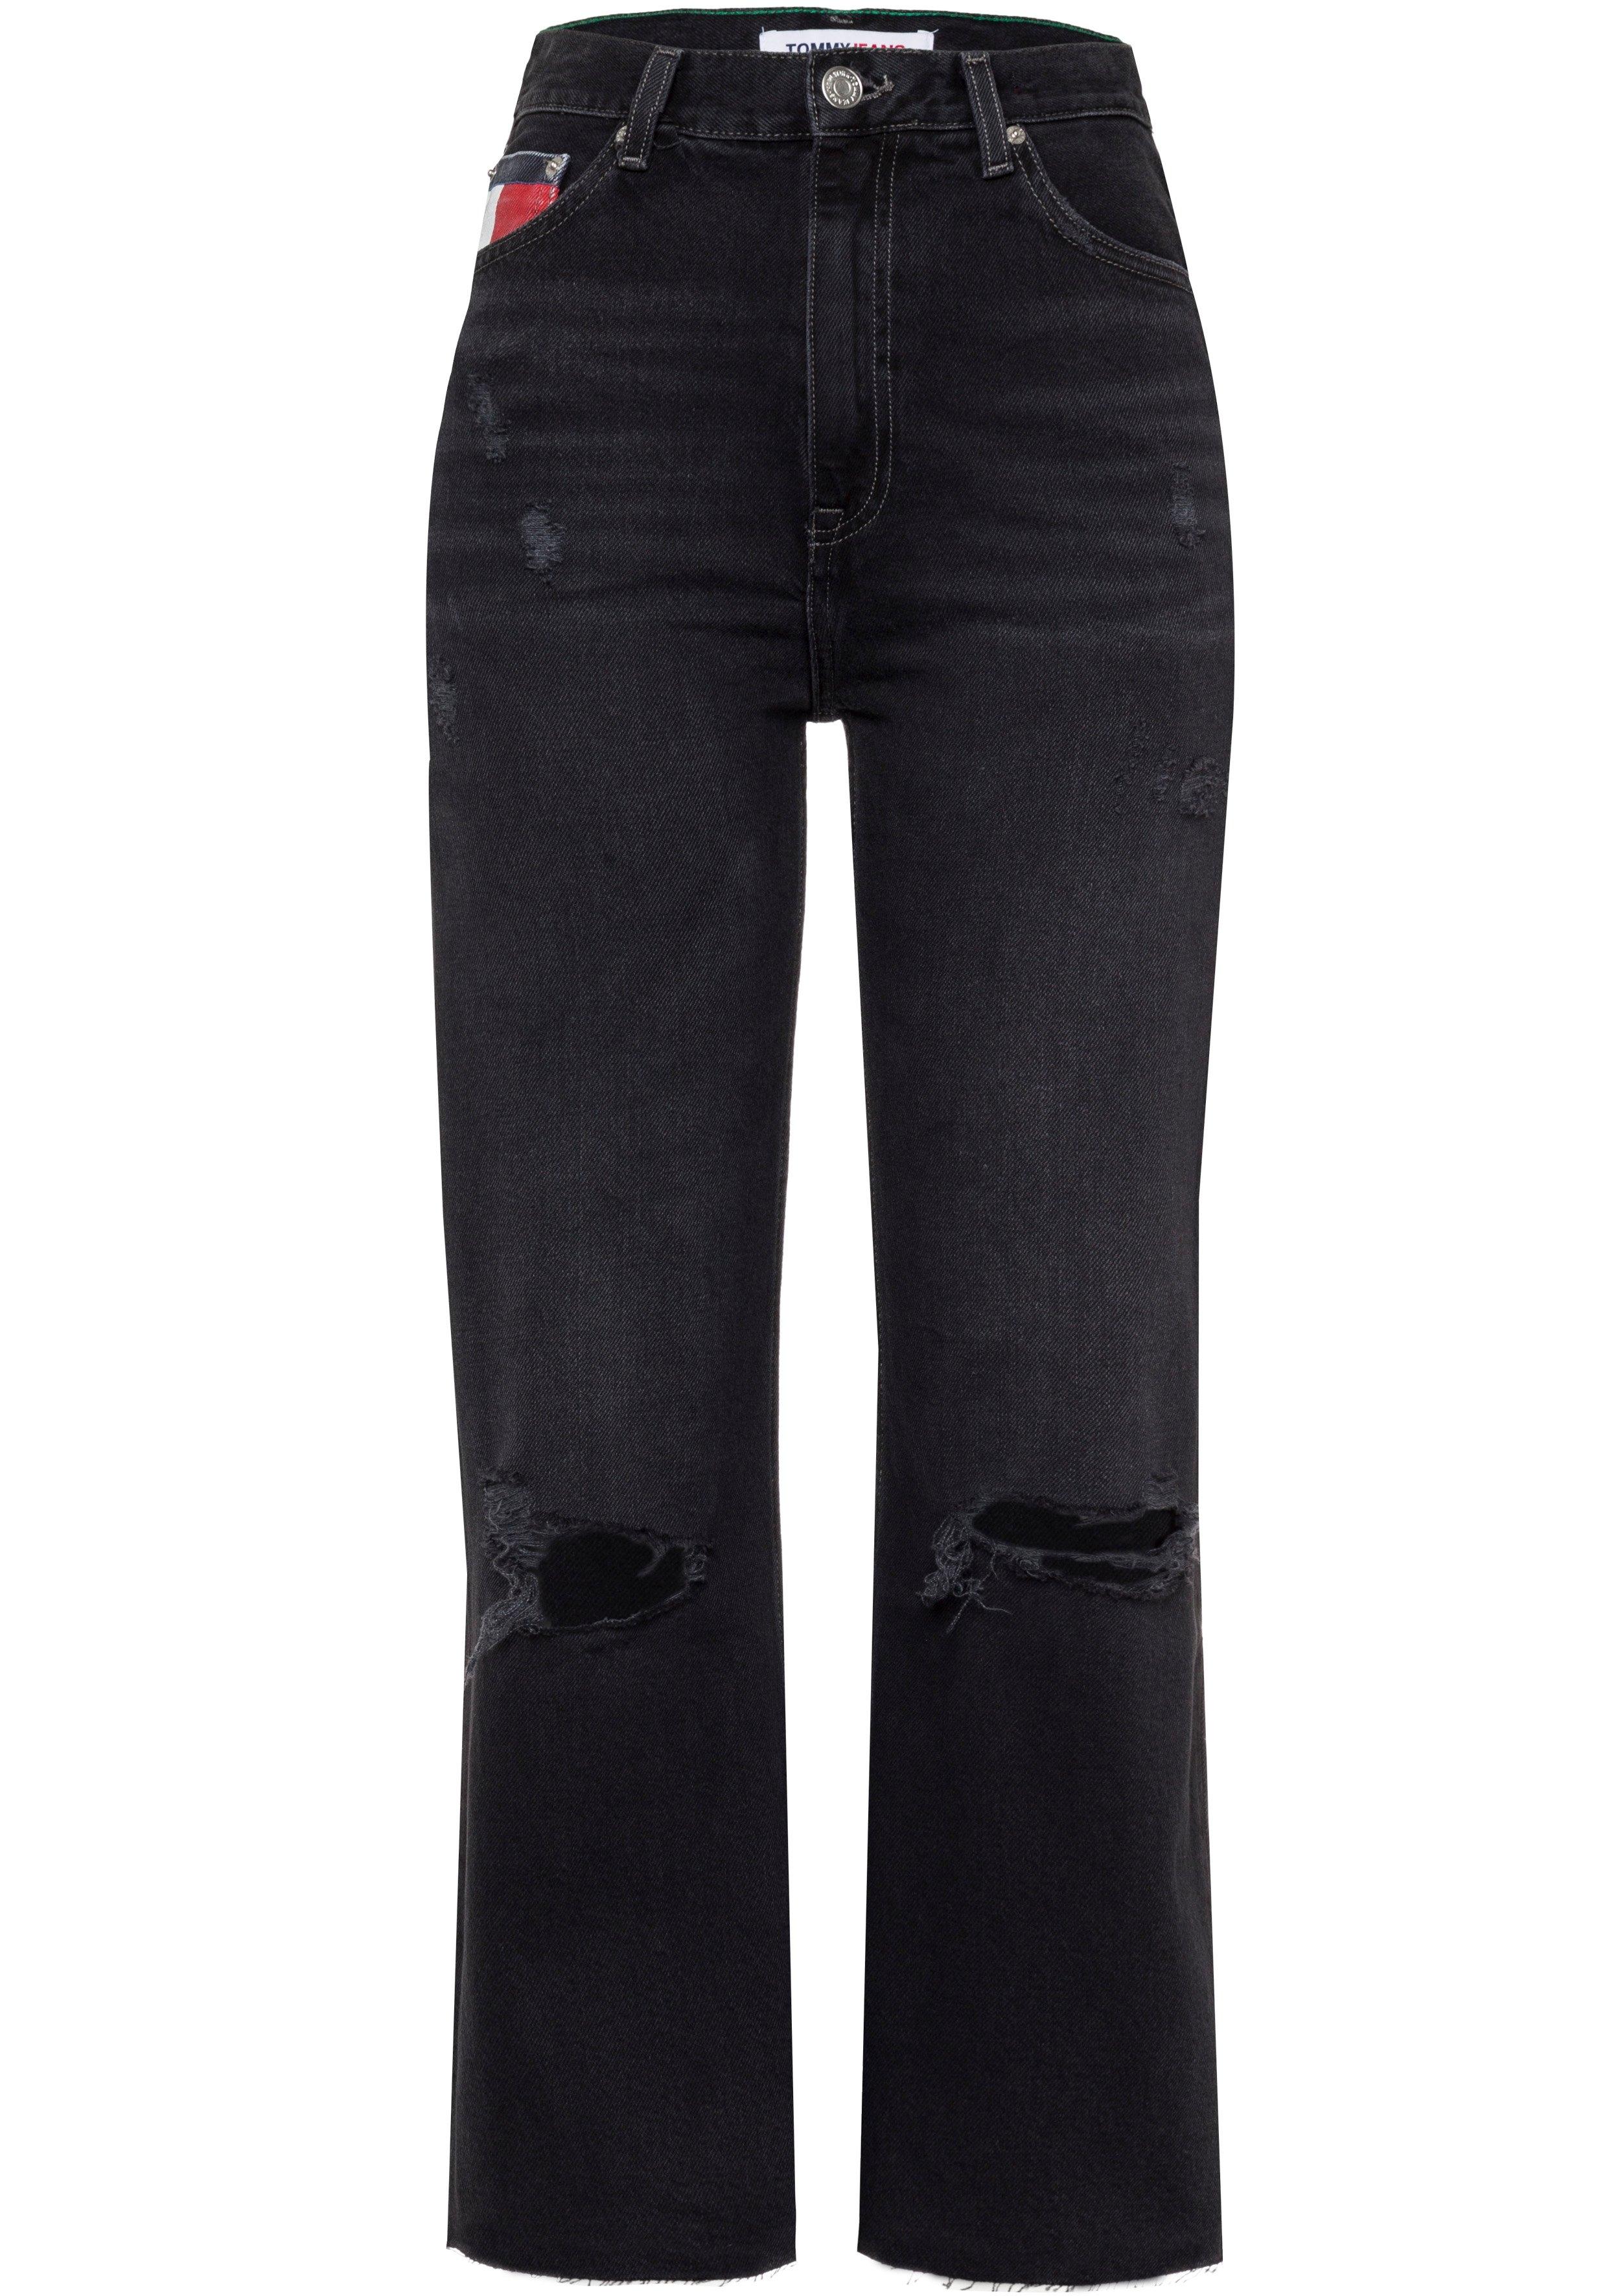 TOMMY JEANS ankle jeans HARPER HR FLARE ANKLE in five-pocketsmodel en met faded-out-effecten - verschillende betaalmethodes